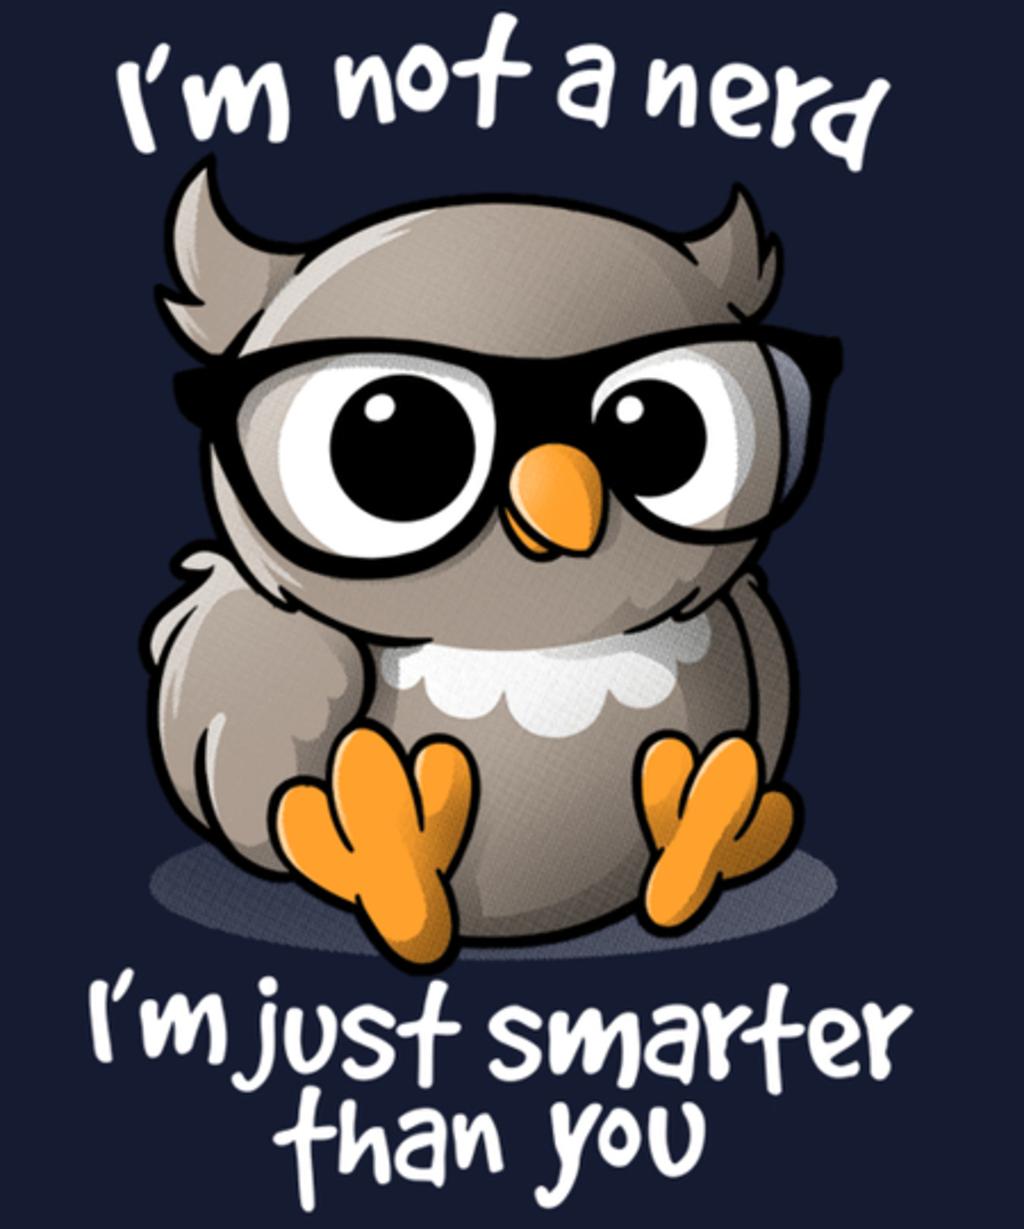 Qwertee: Nerd owl